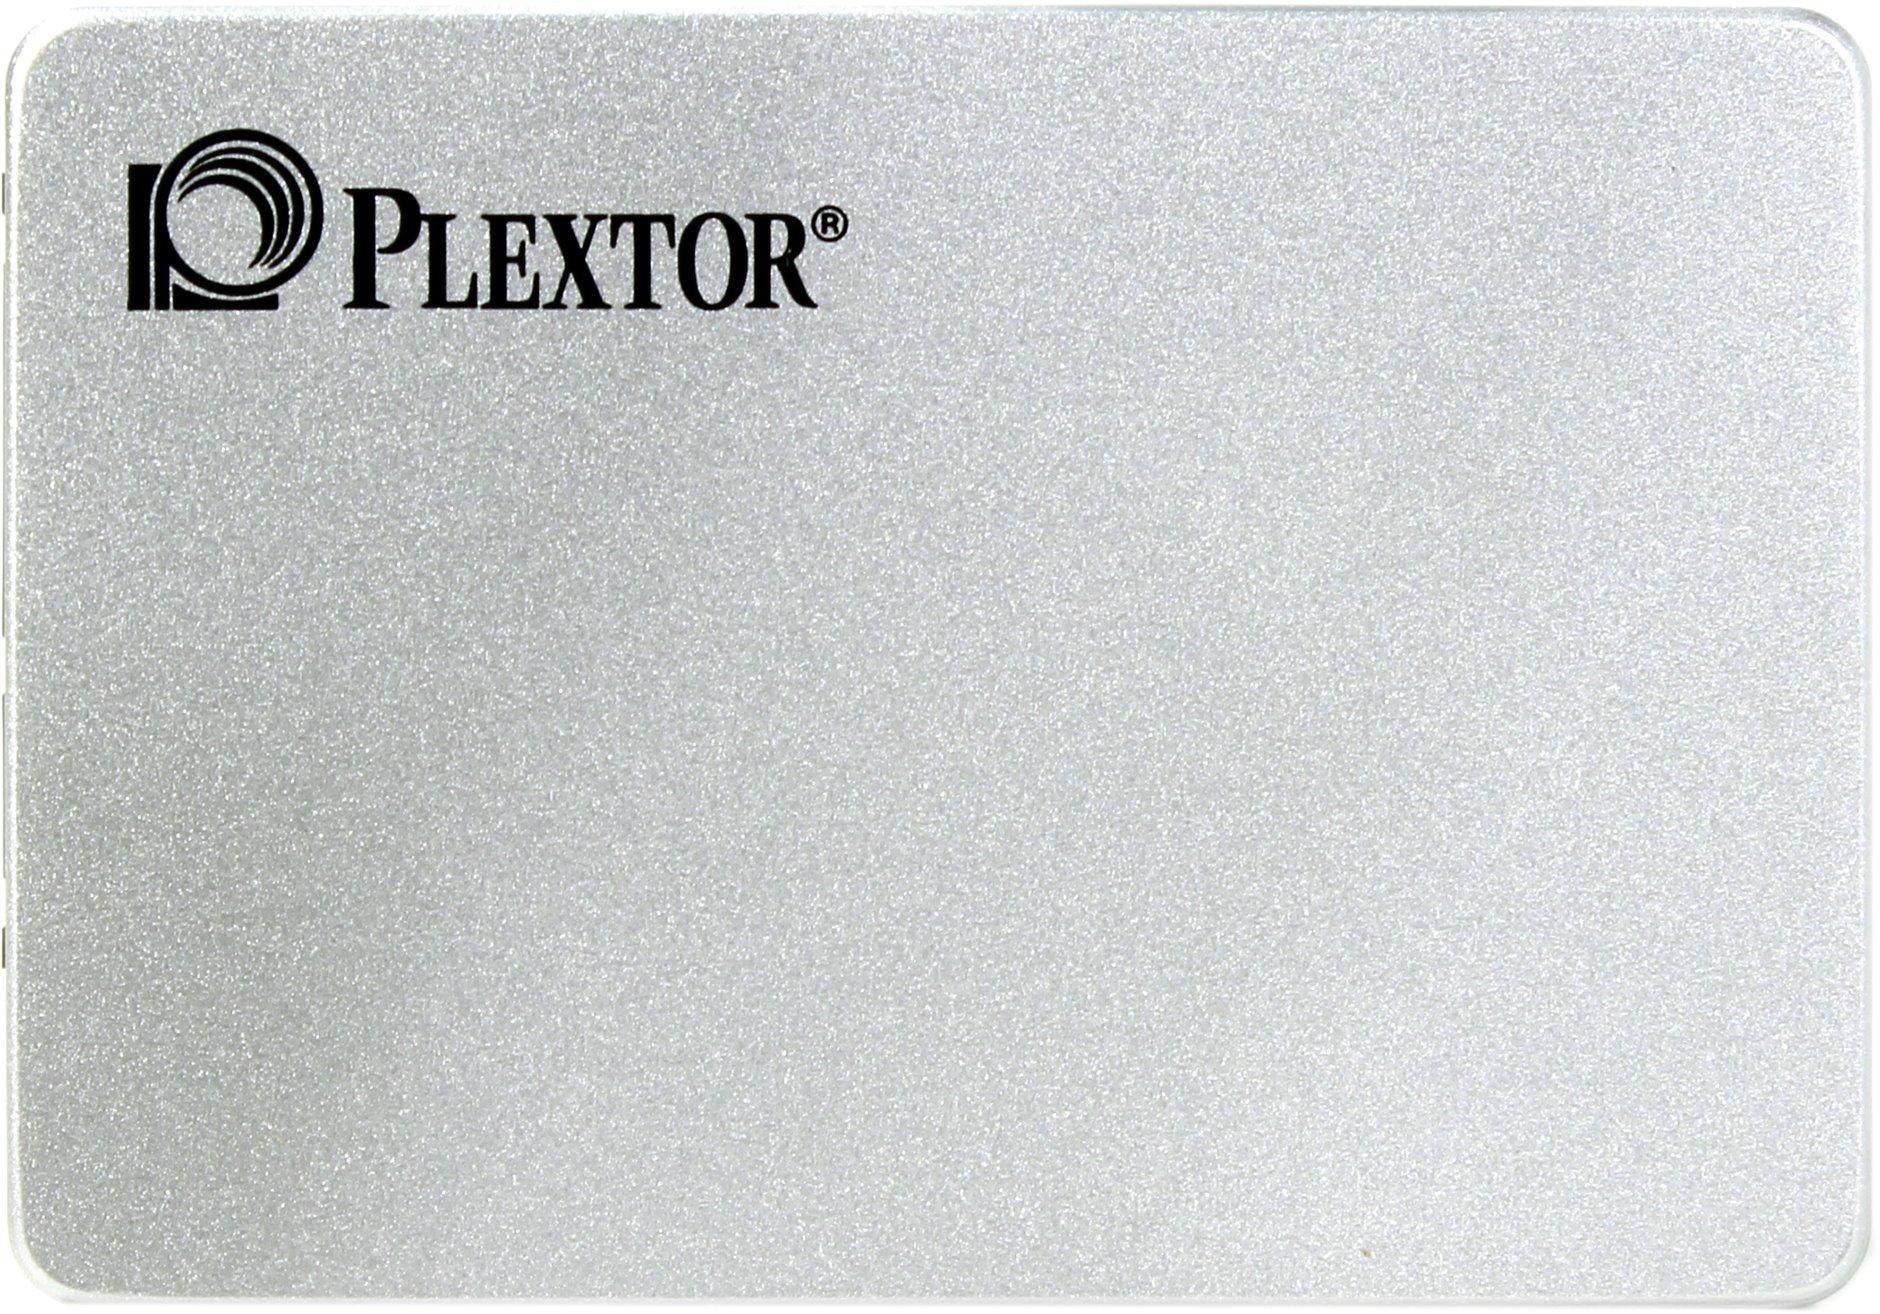 Plextor M7V 512Gb (PX-512M7VC) - SSD-накопитель (Silver)